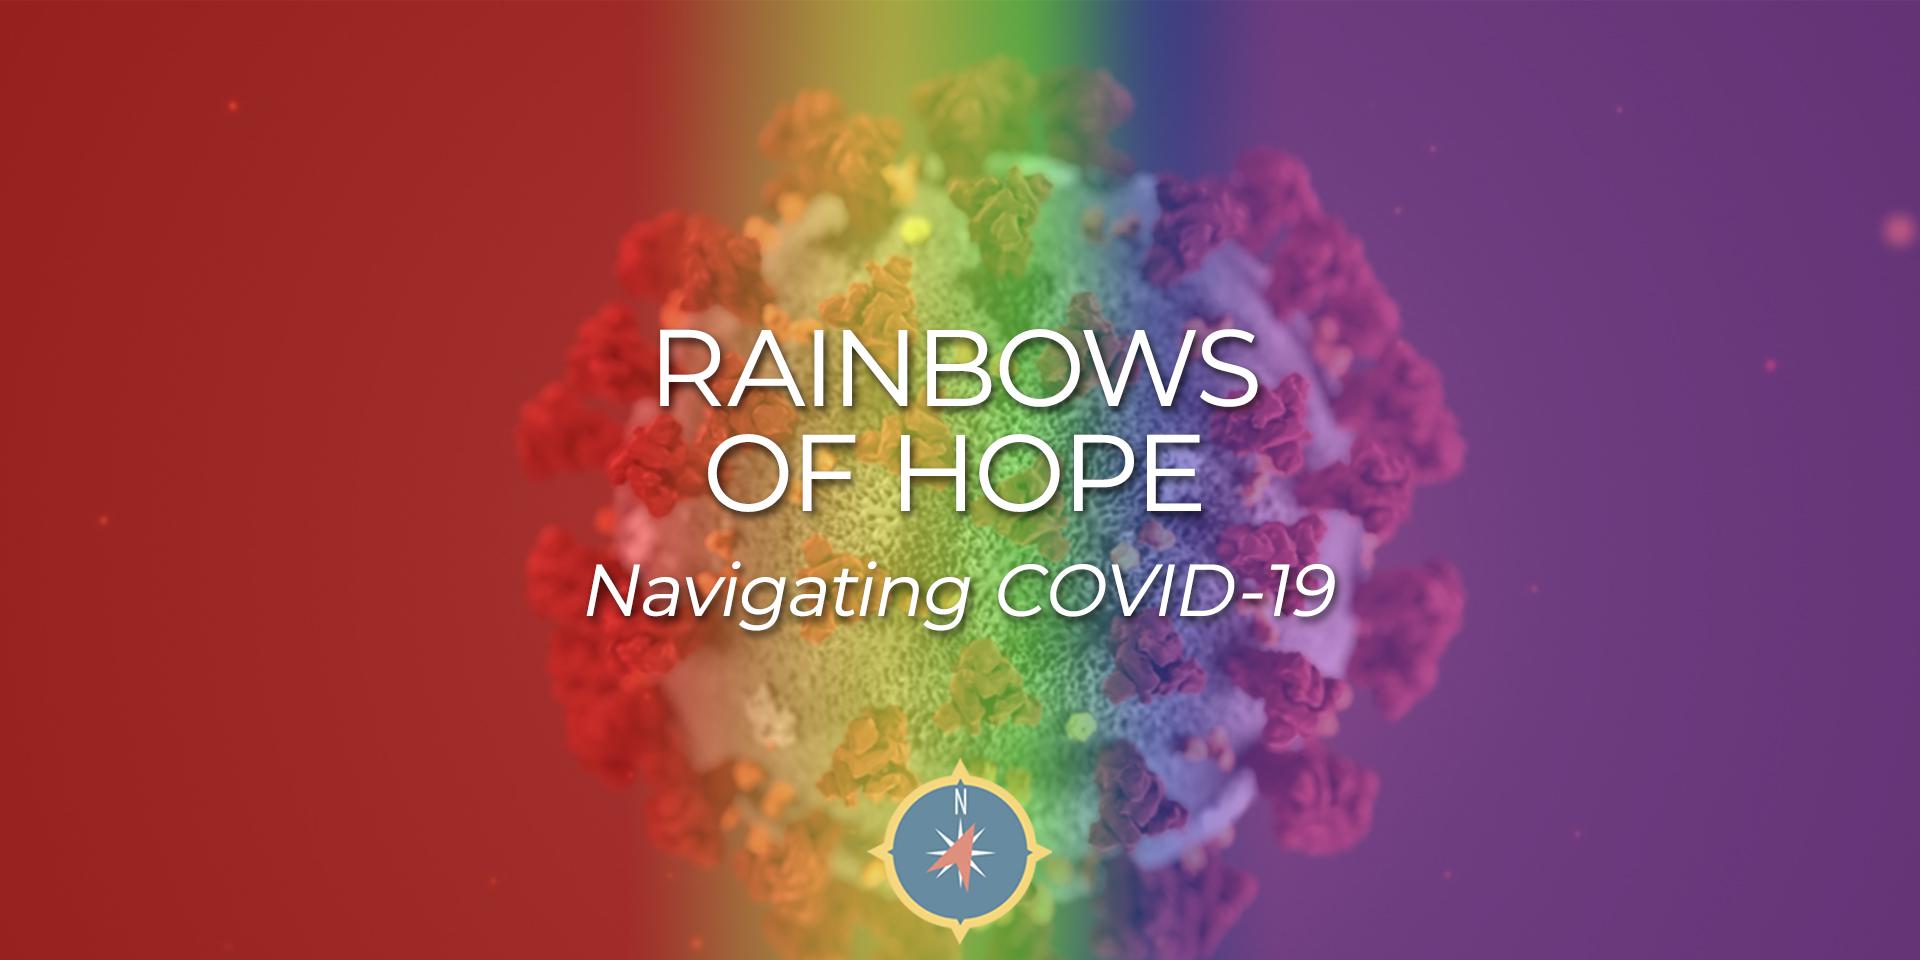 Rainbows of HOPE & COVID-19